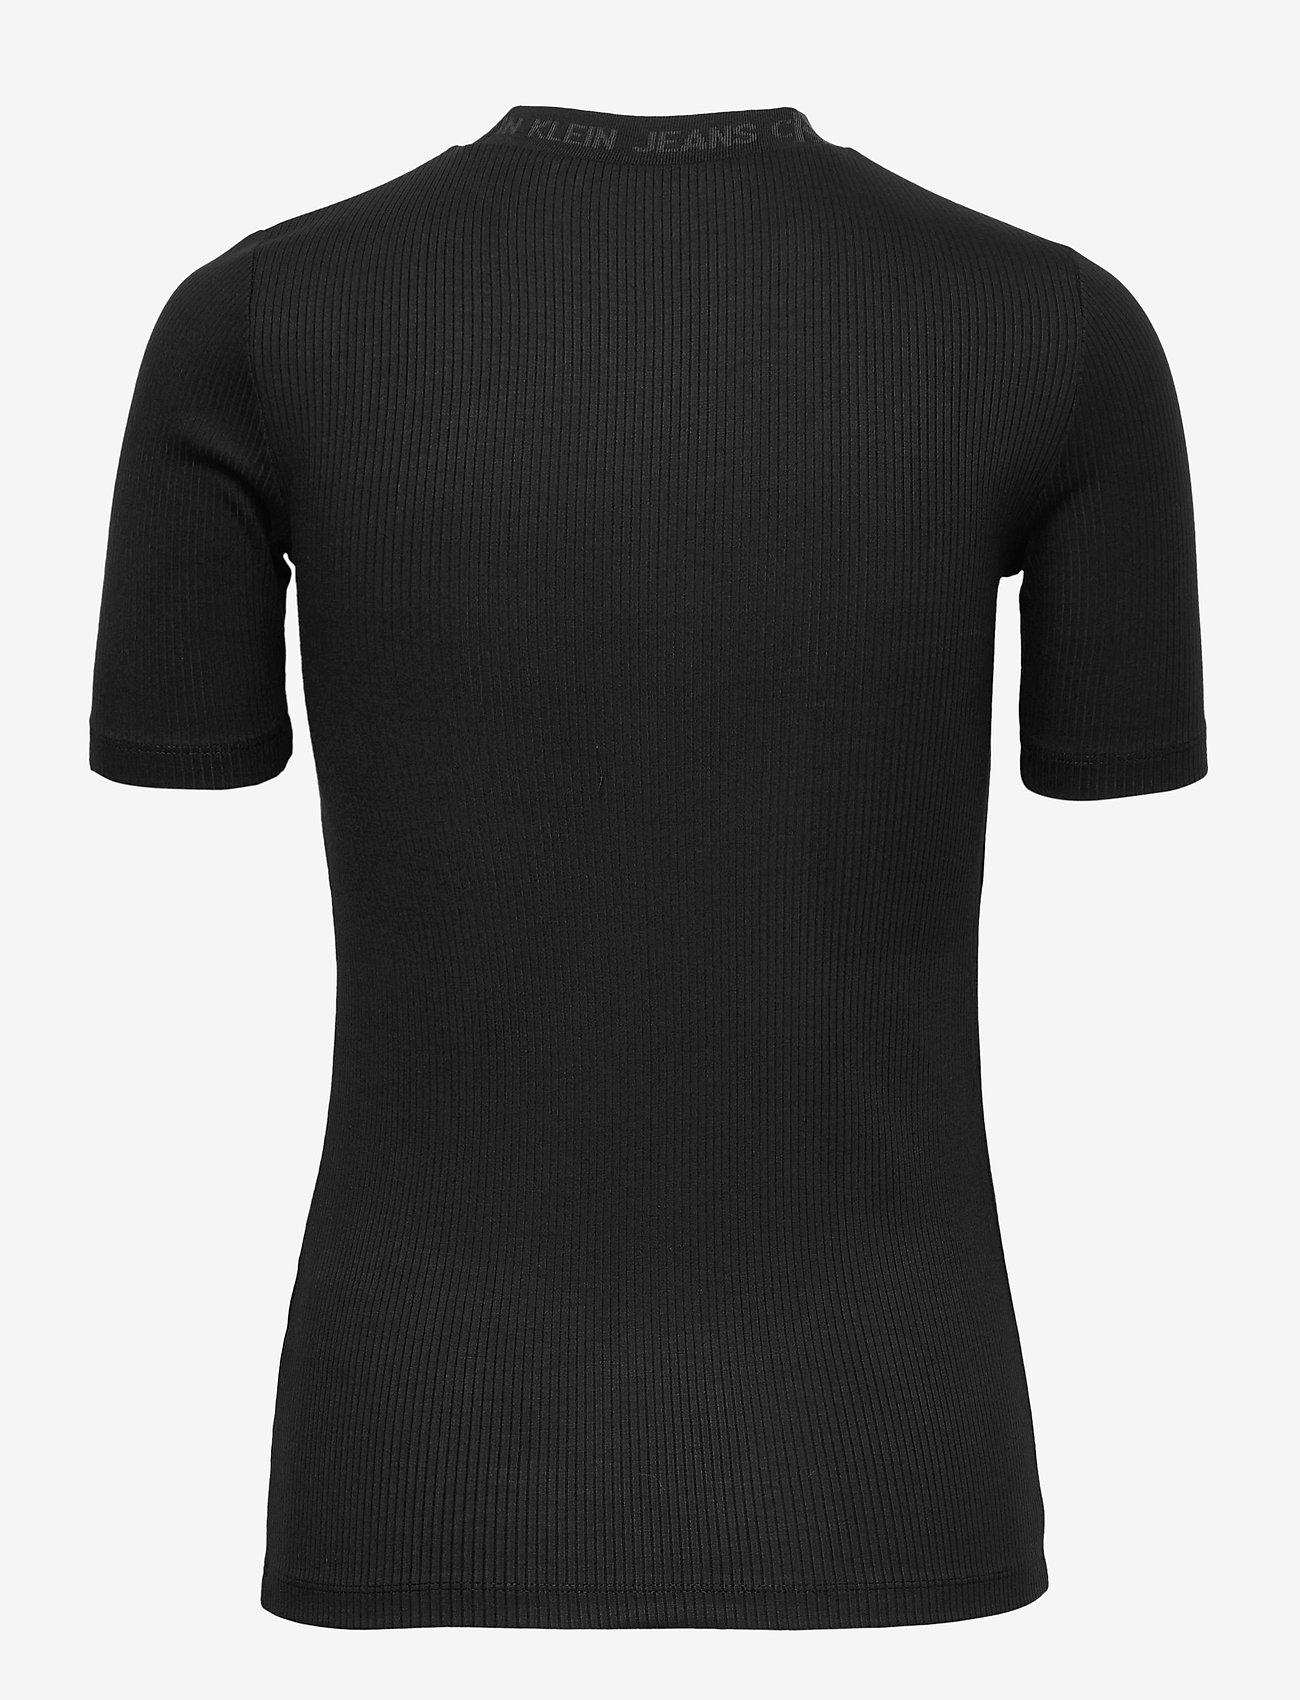 Calvin Klein Jeans - LOGO TRIM RIB TEE - strikkede toppe - ck black - 1